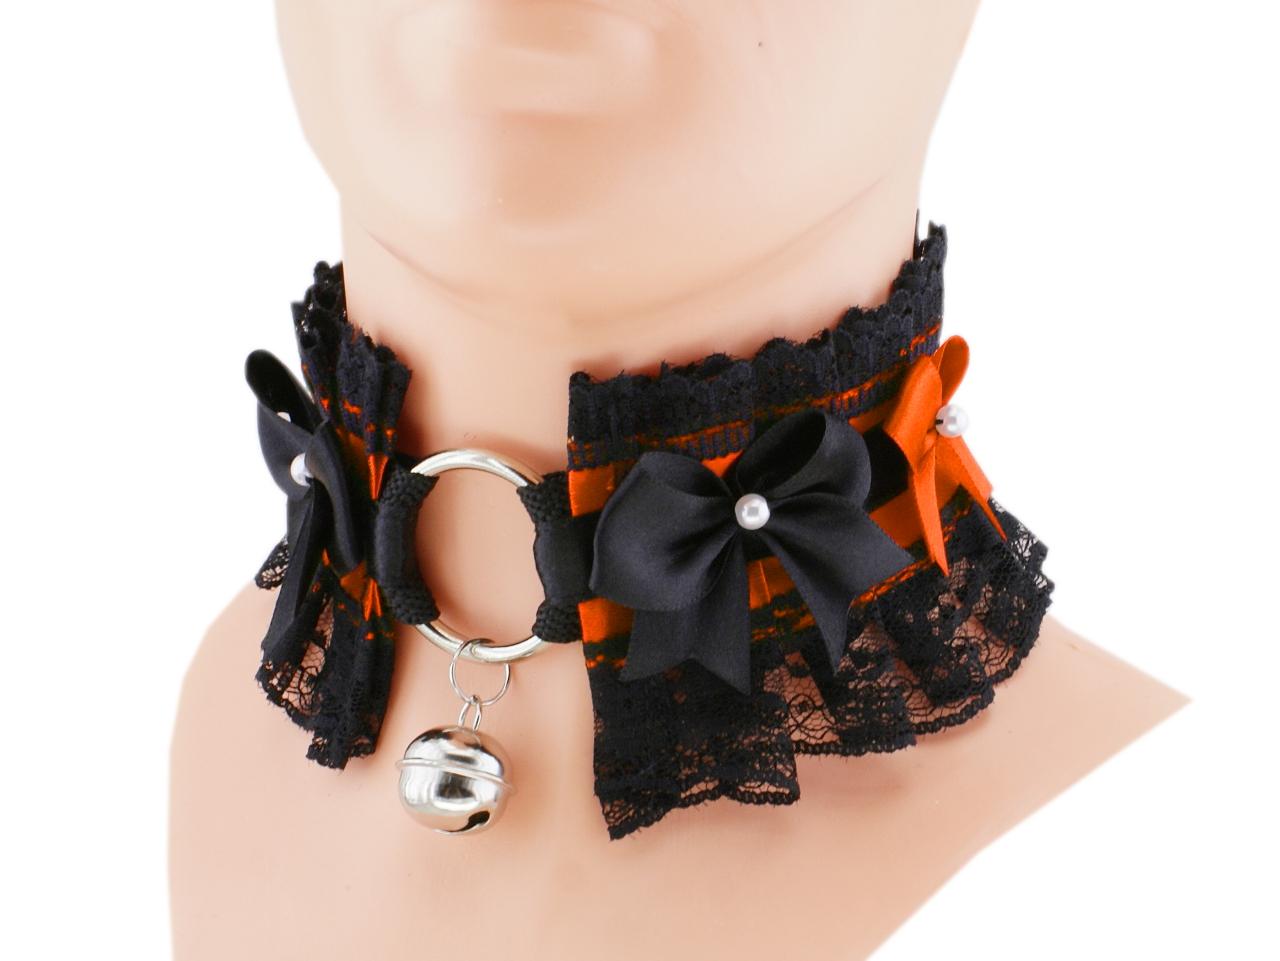 orange ddlg collar black collar Kitten play collar bdsm